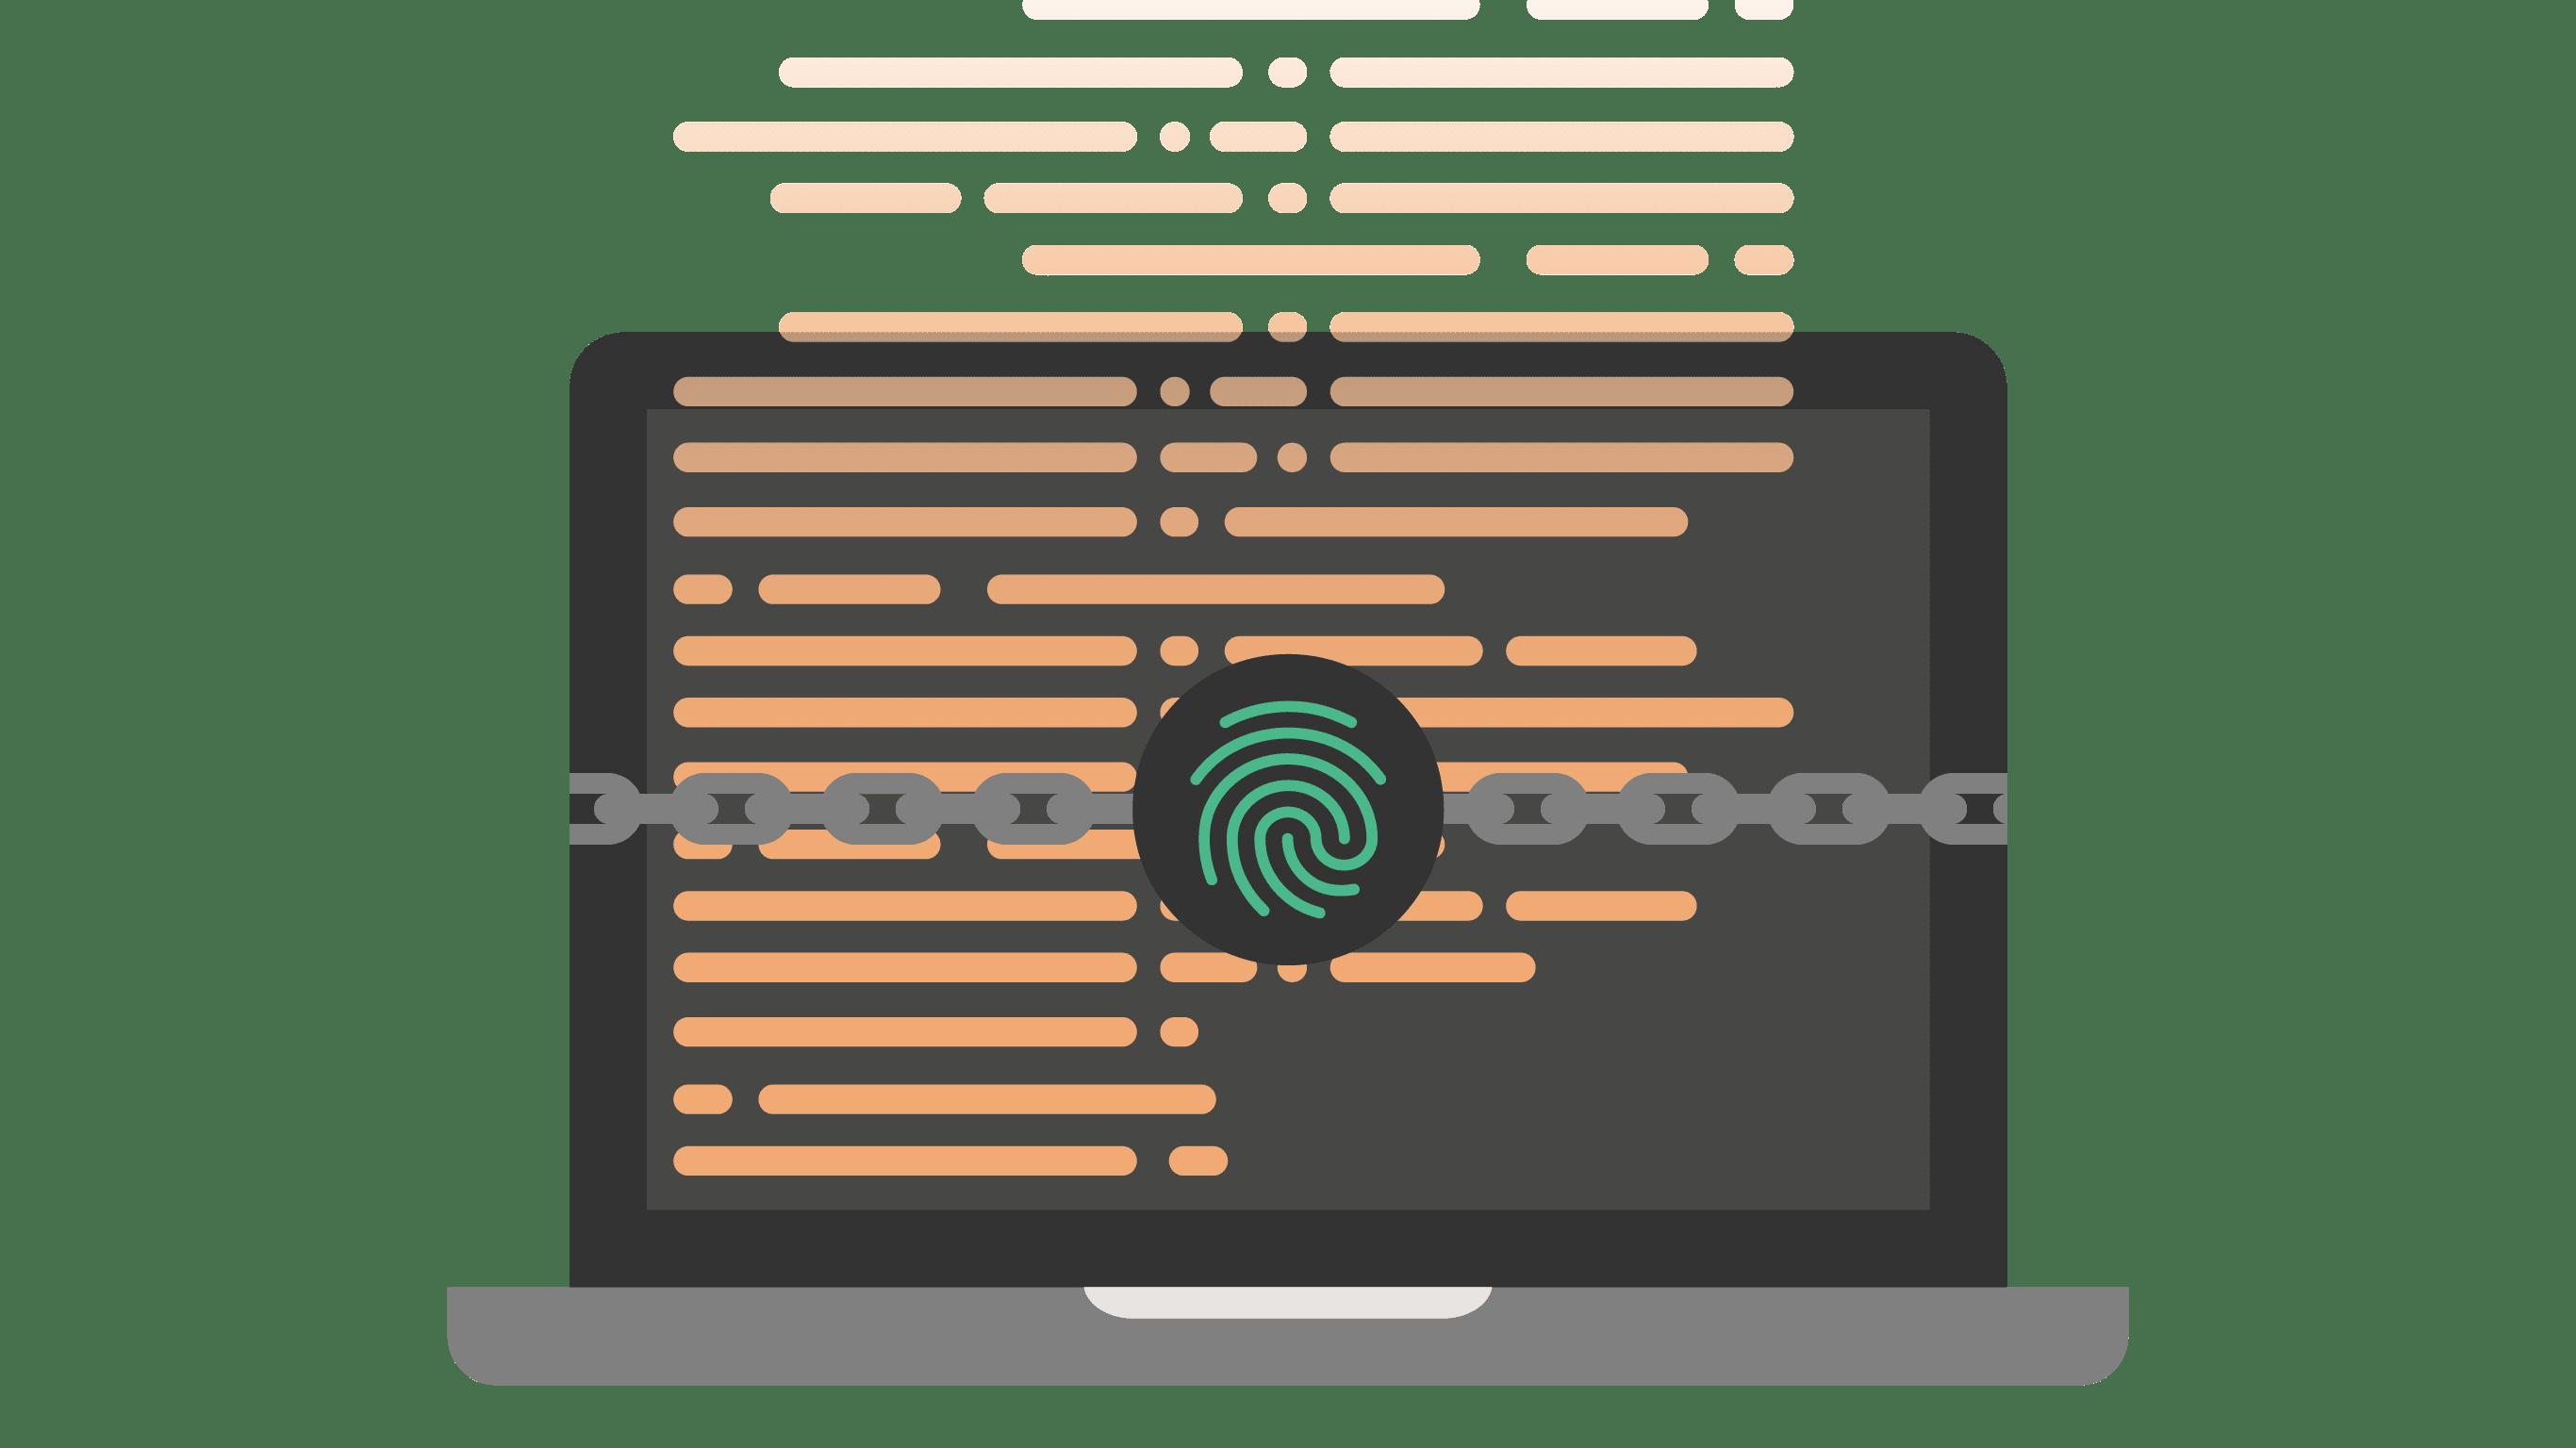 Intranet security illustration